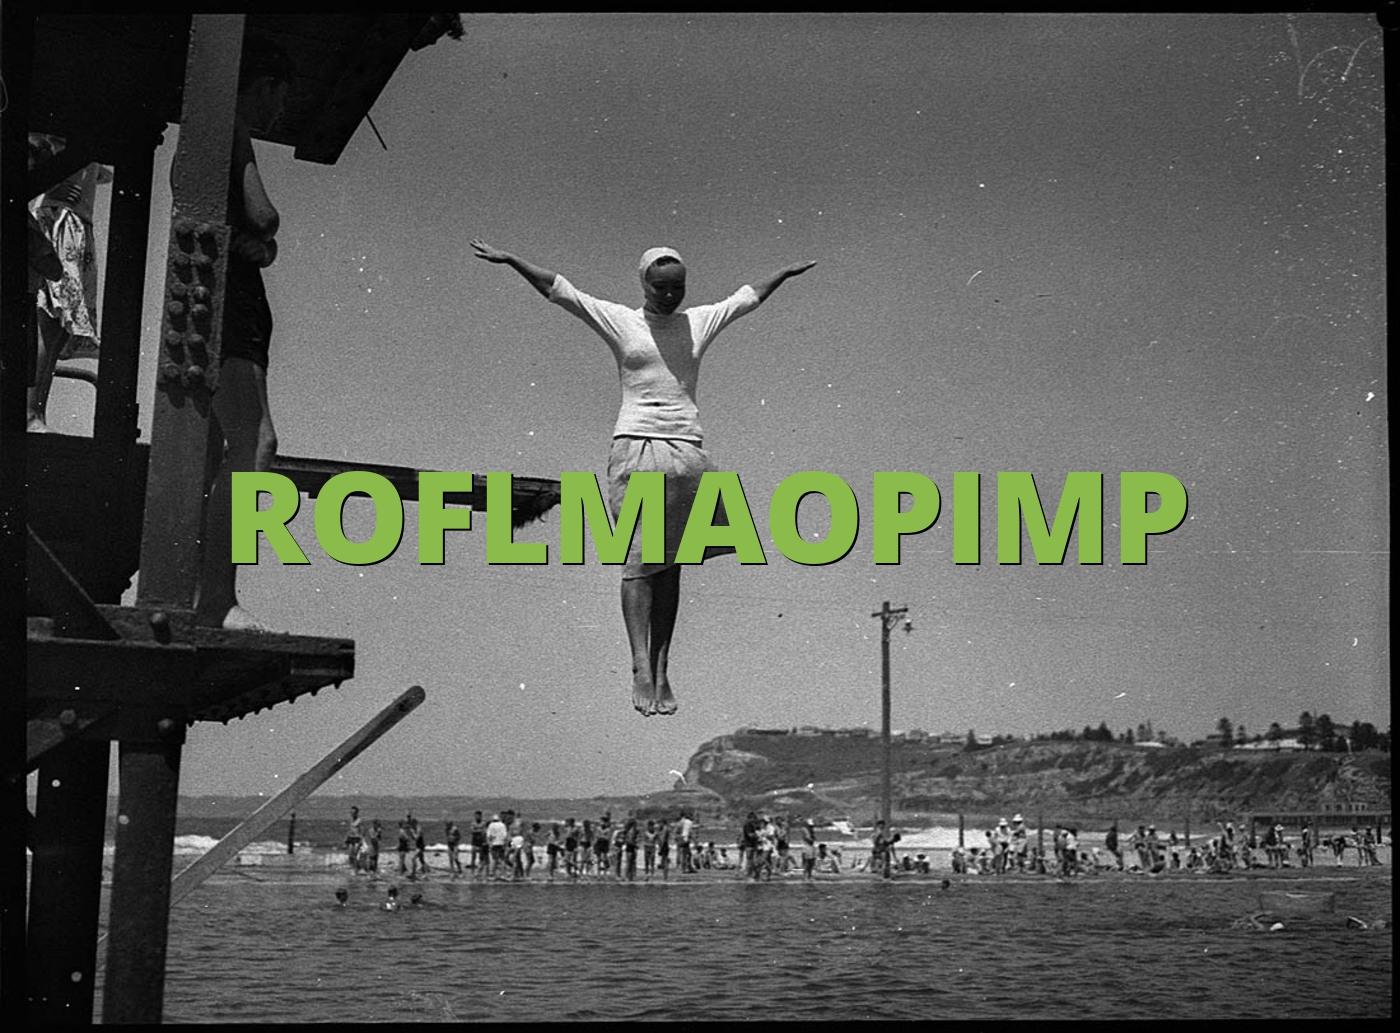 ROFLMAOPIMP